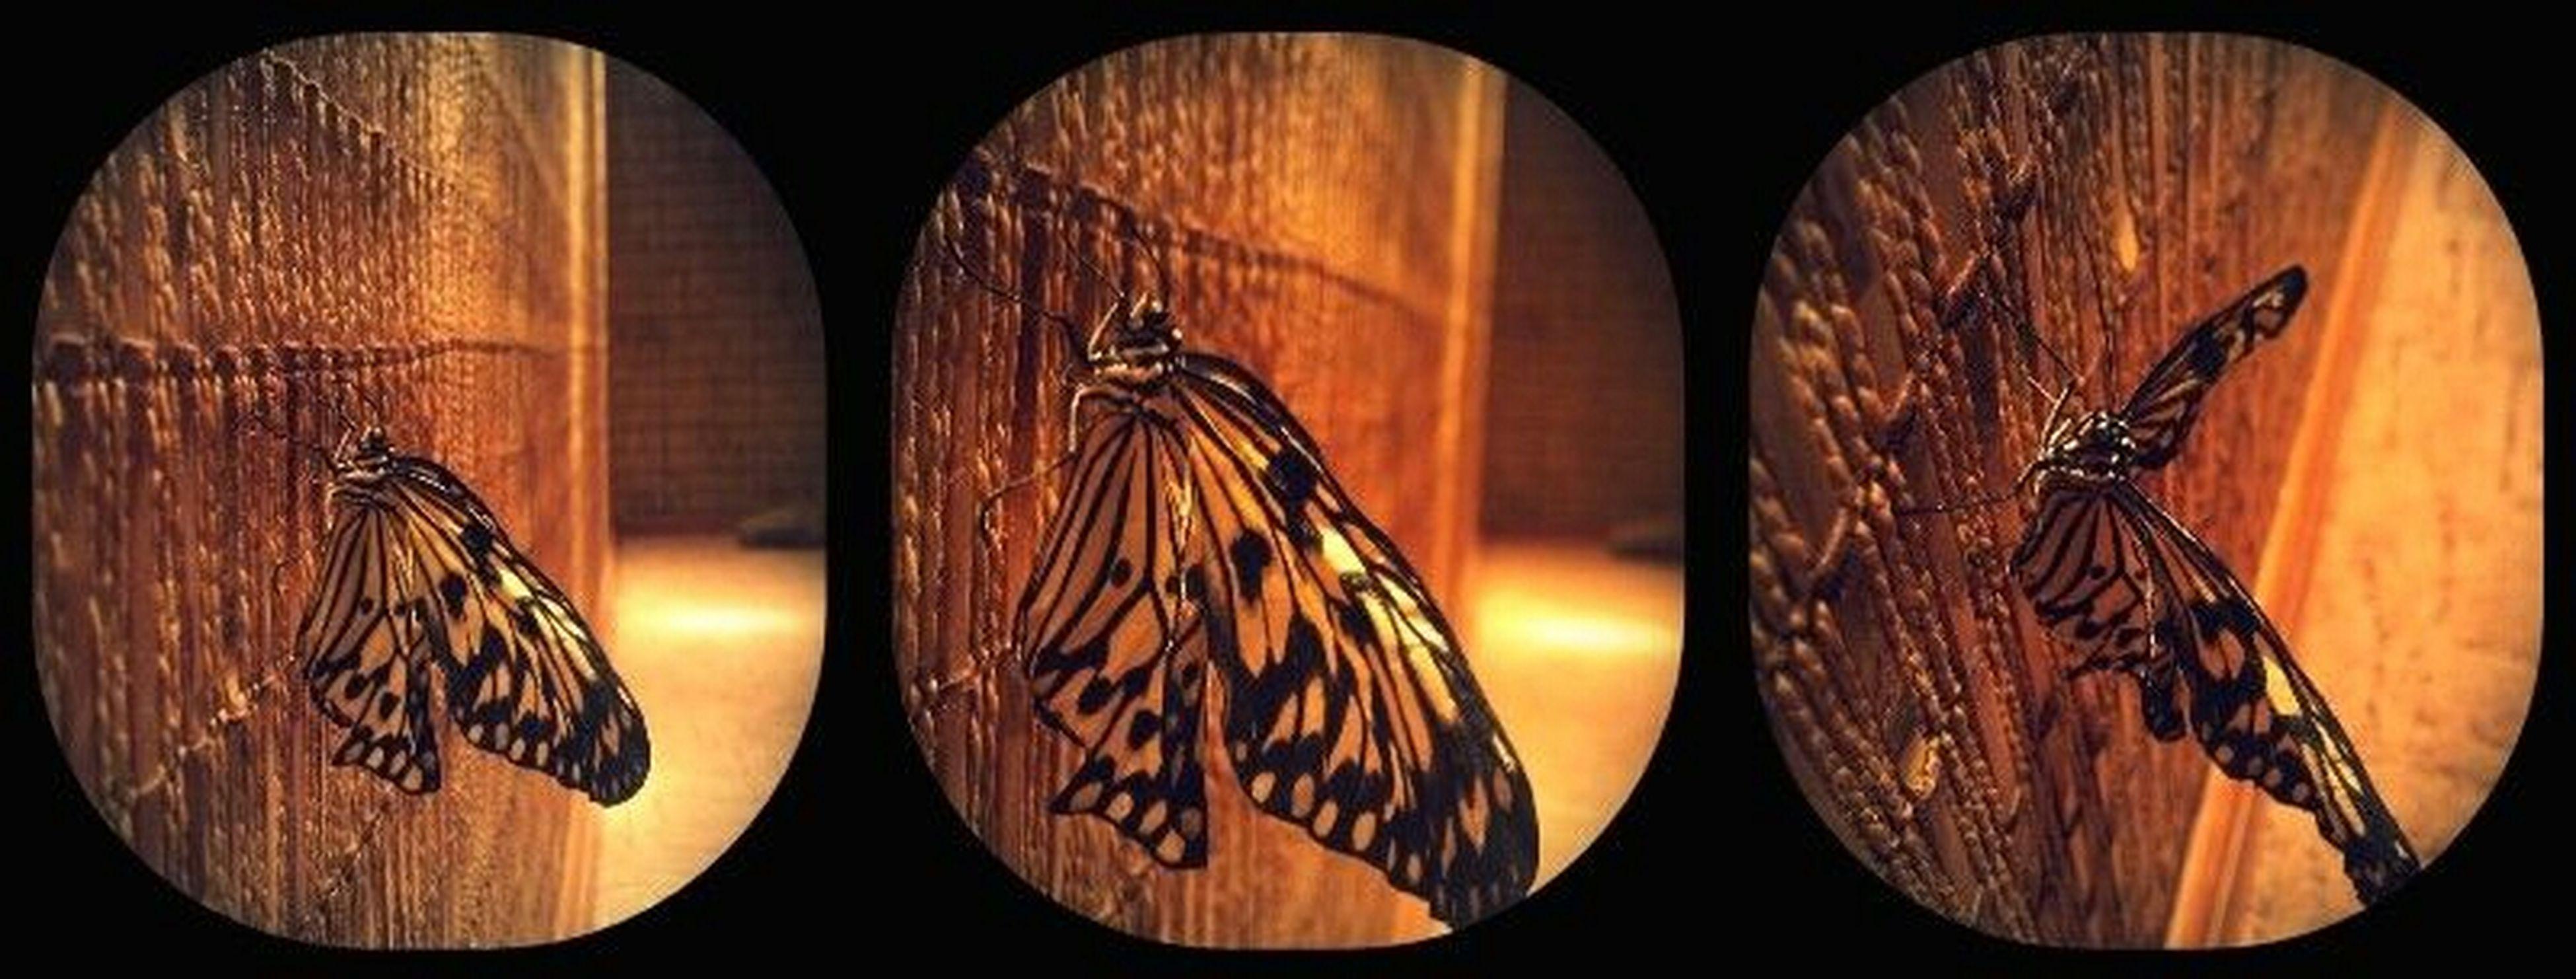 circle, orange color, illuminated, close-up, night, pattern, indoors, no people, hanging, geometric shape, electricity, yellow, shape, decoration, design, wood - material, lighting equipment, glowing, sunset